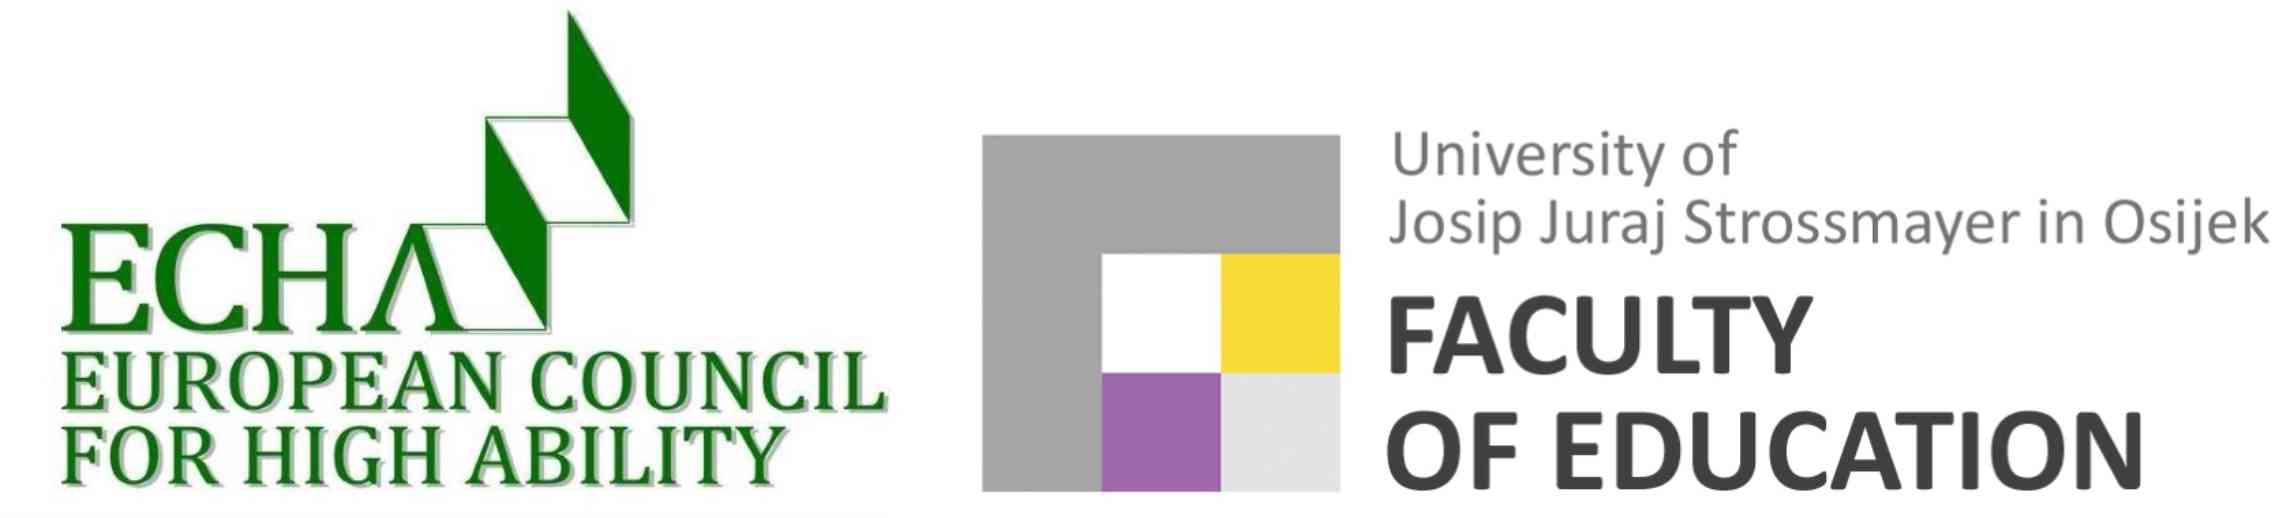 ECHA - EUROPEAN COUNCIL FOR HIGH ABILITY, DUBROVNIK October 16-18, 2019